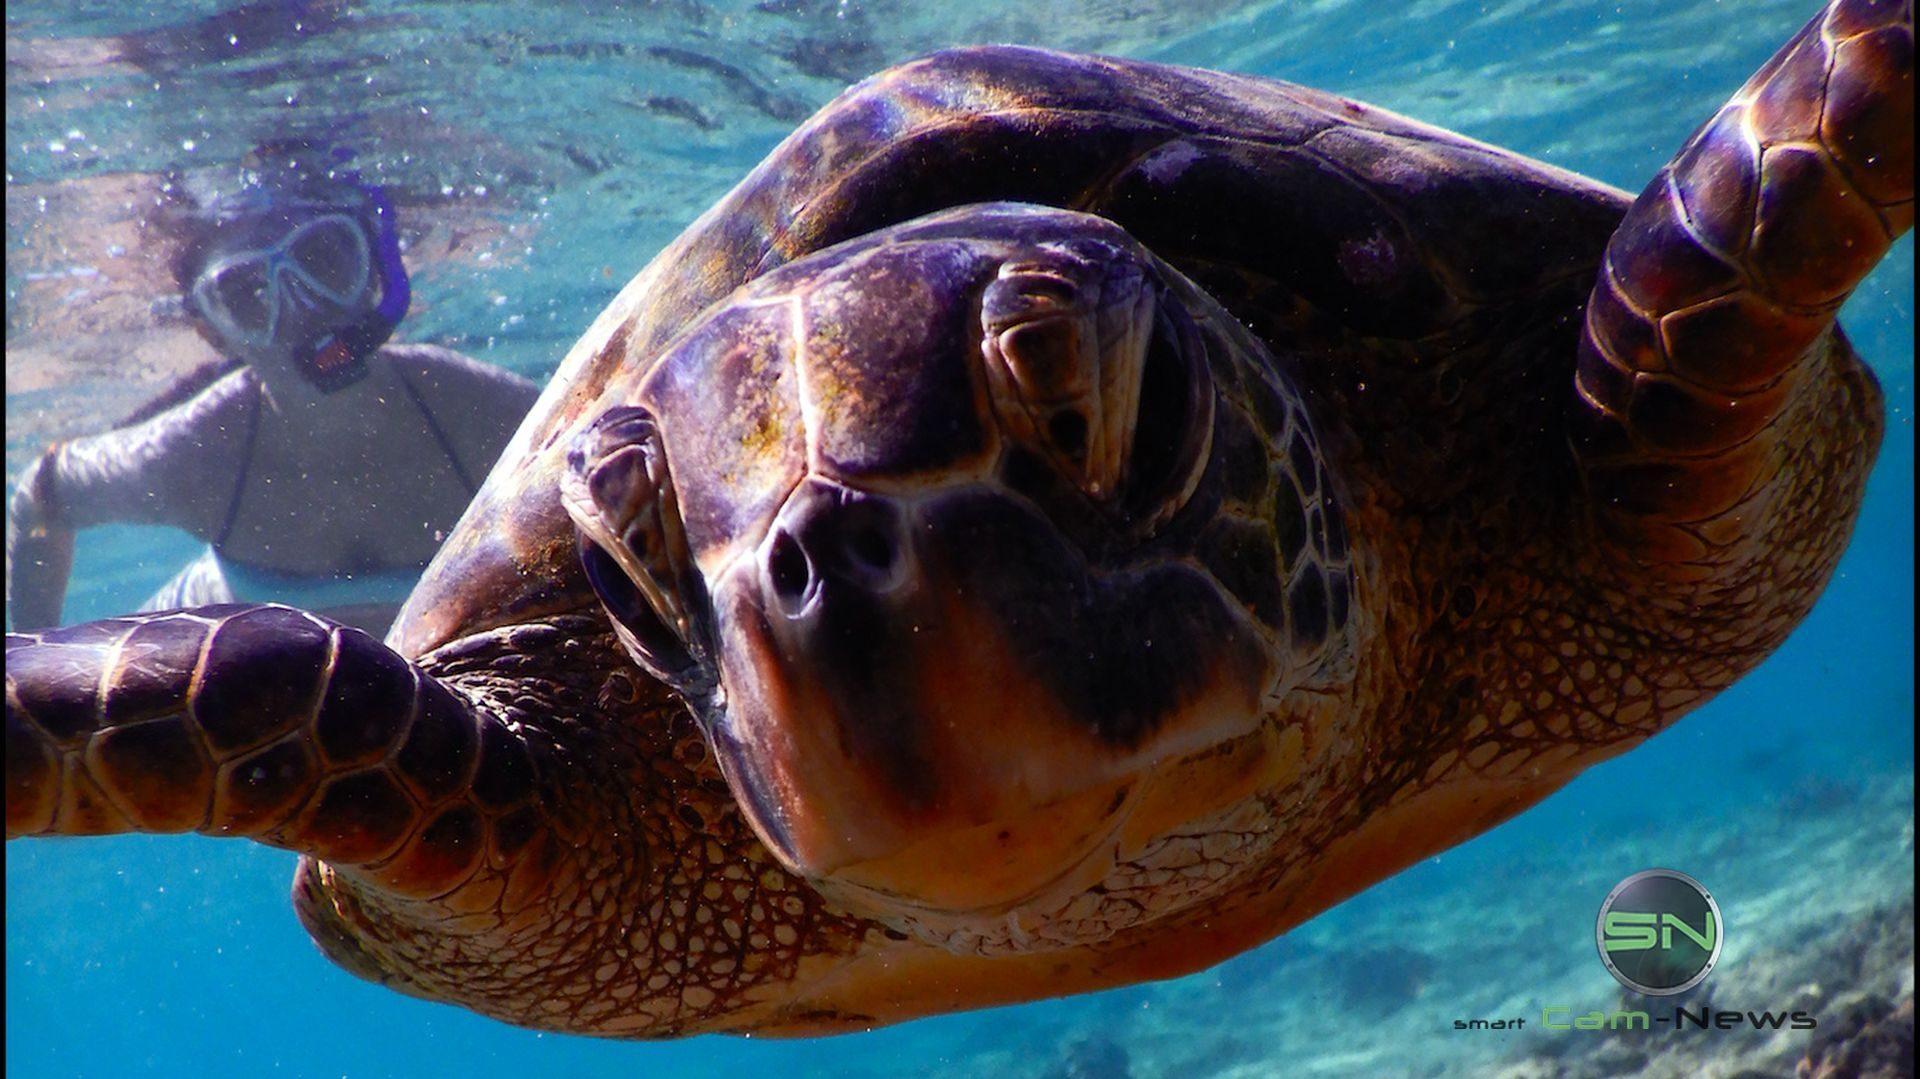 Schildkröte Hawaii - Nikon W300